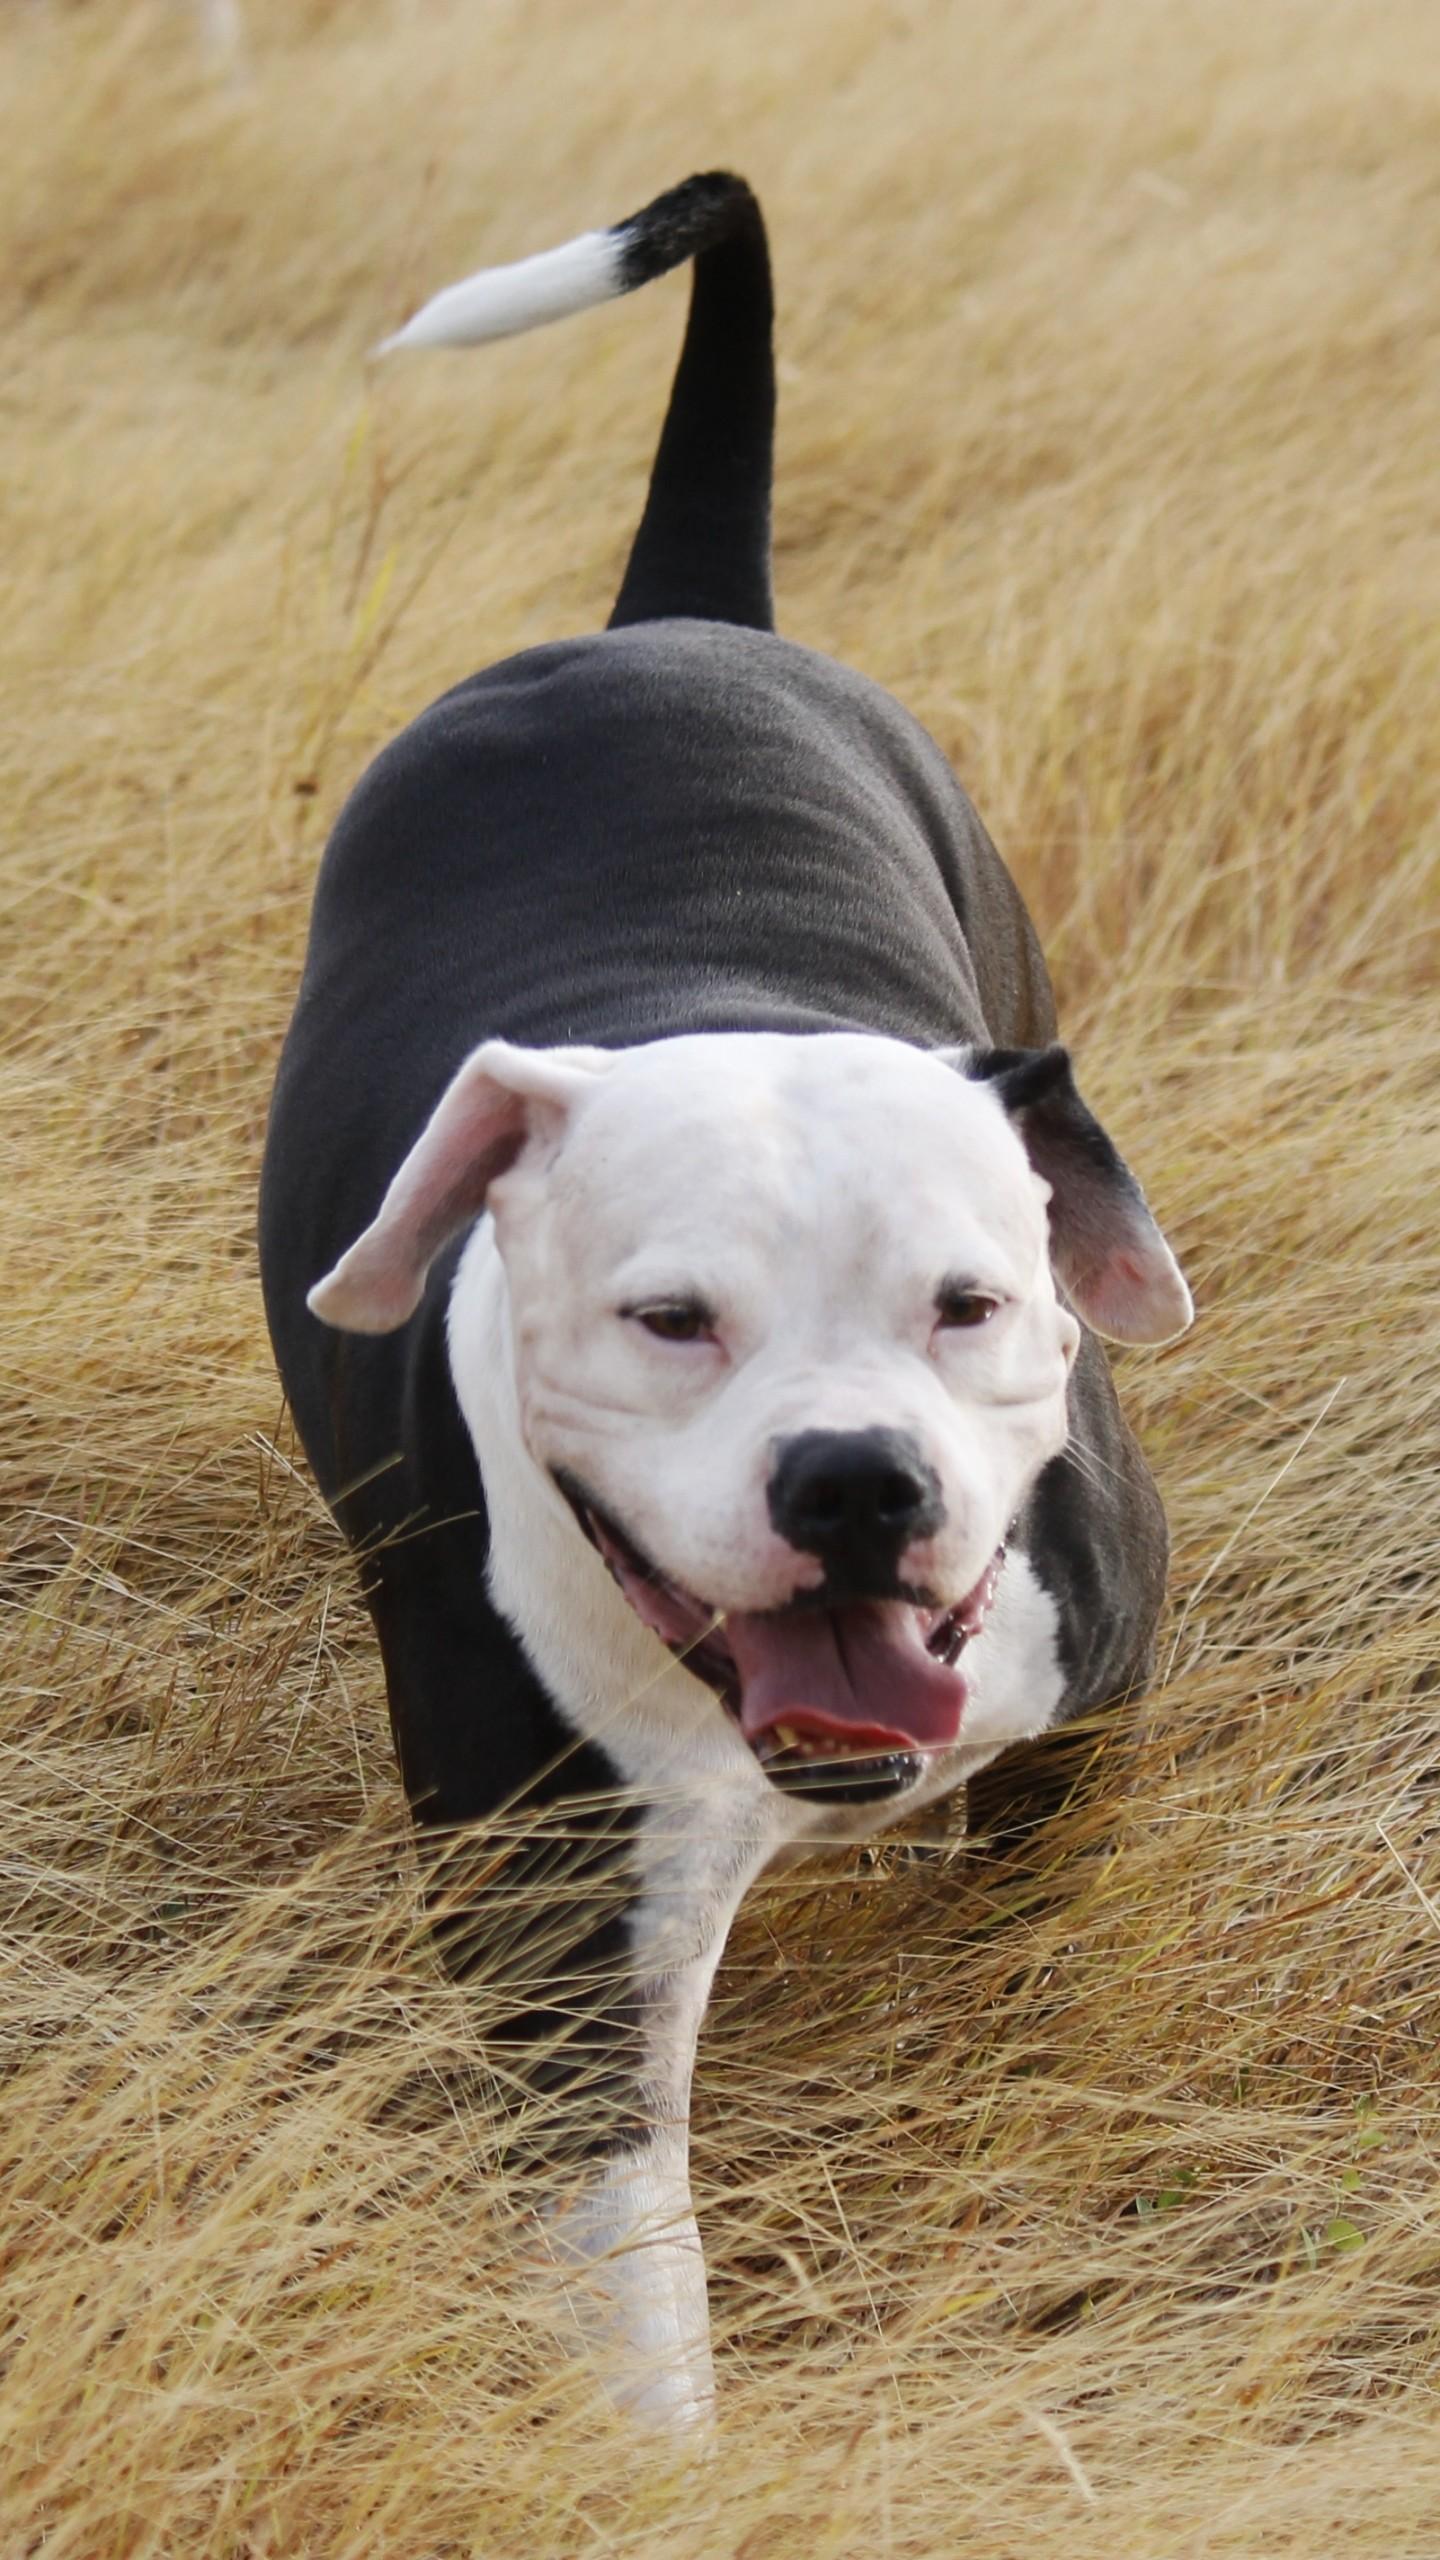 Pitbull Dog Wallpaper 183 ① Wallpapertag